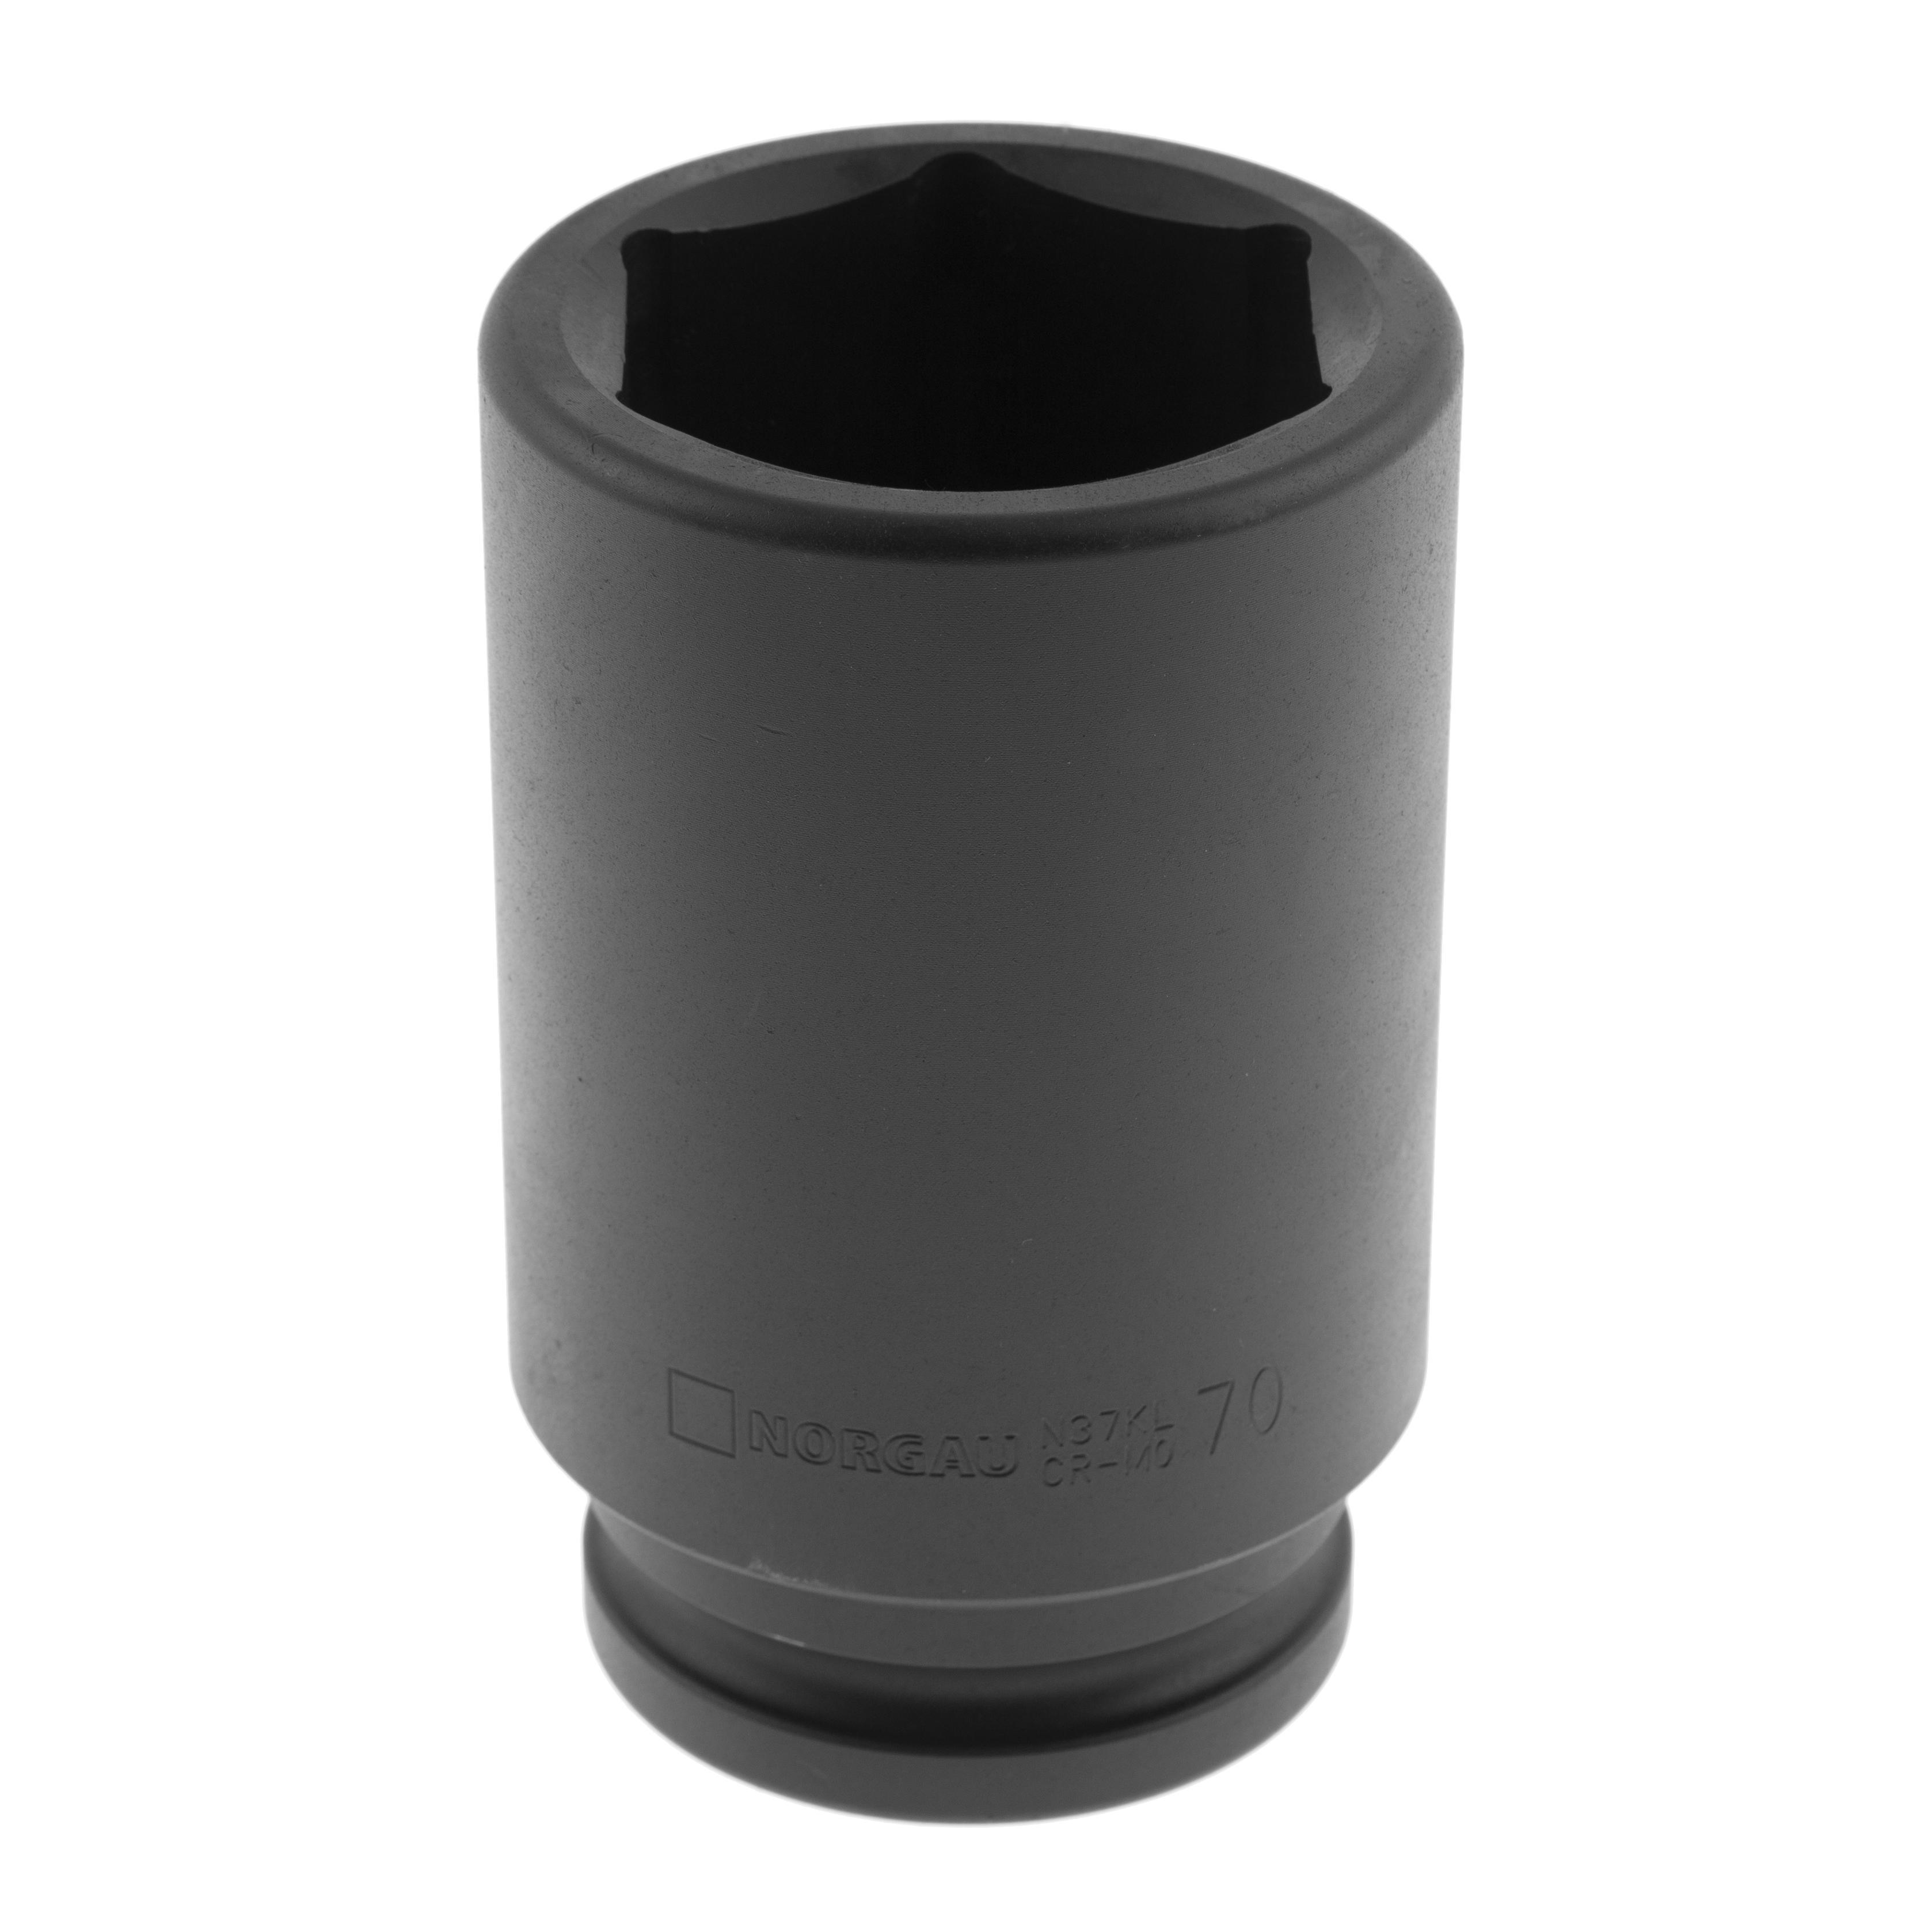 Головка Norgau N37kl-70 (064085070) головка norgau n37kl 80 064085080